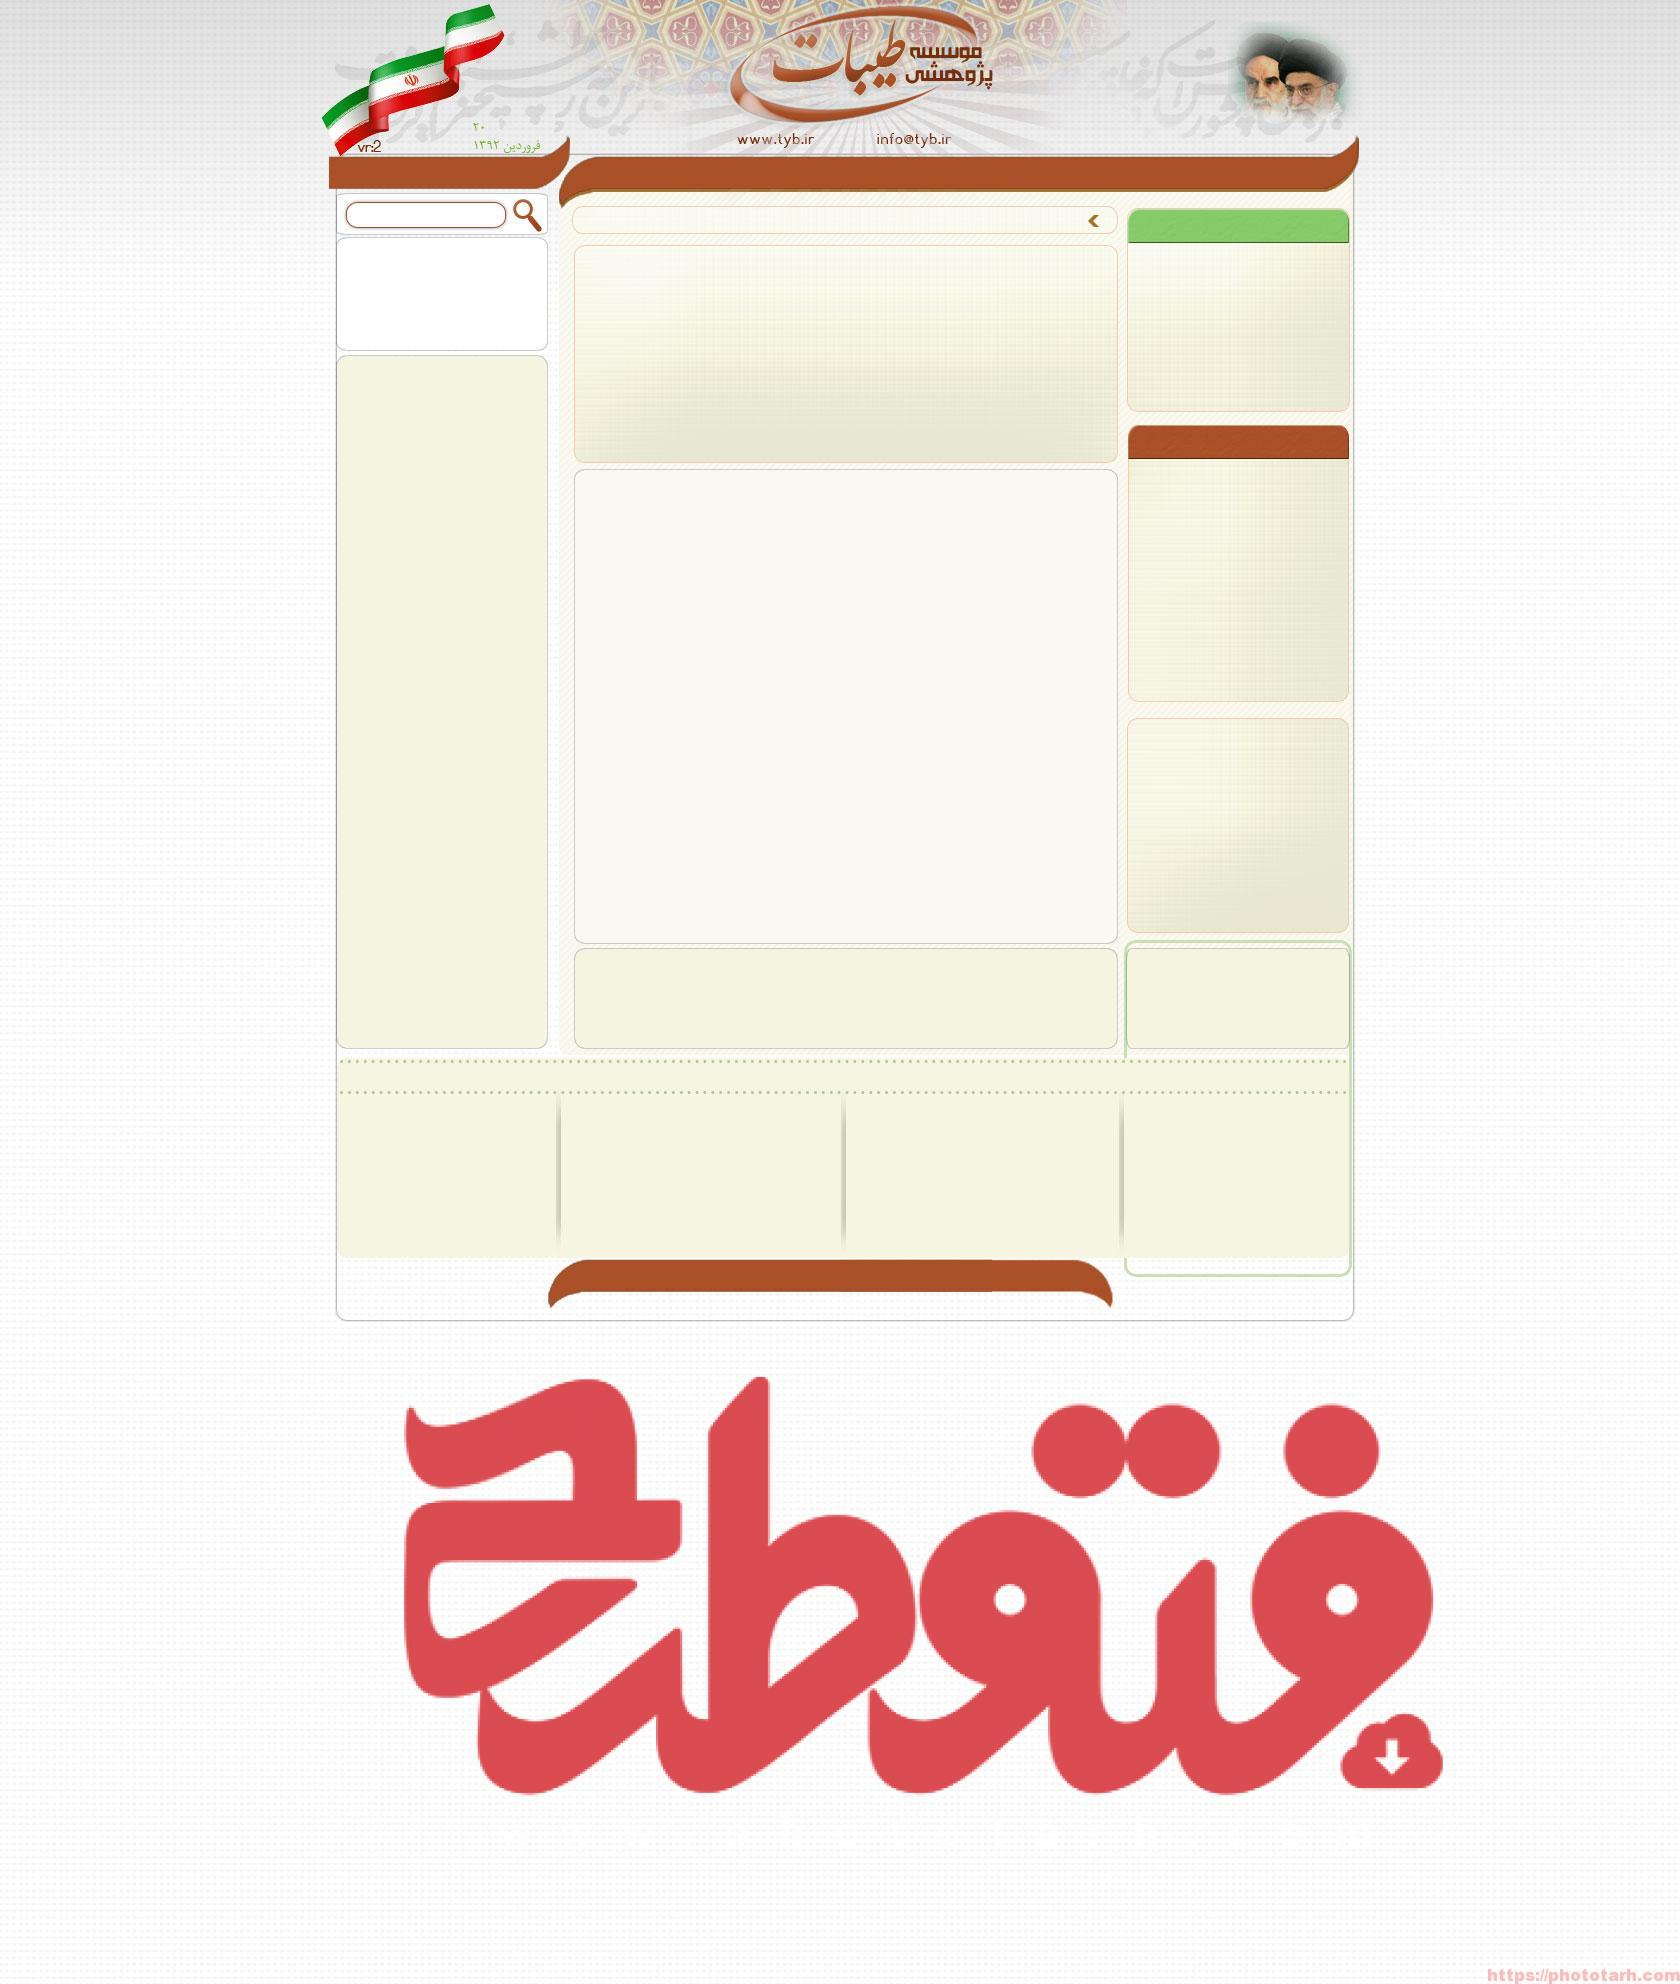 hojji2 - قالب لایه باز سایت مذهبی